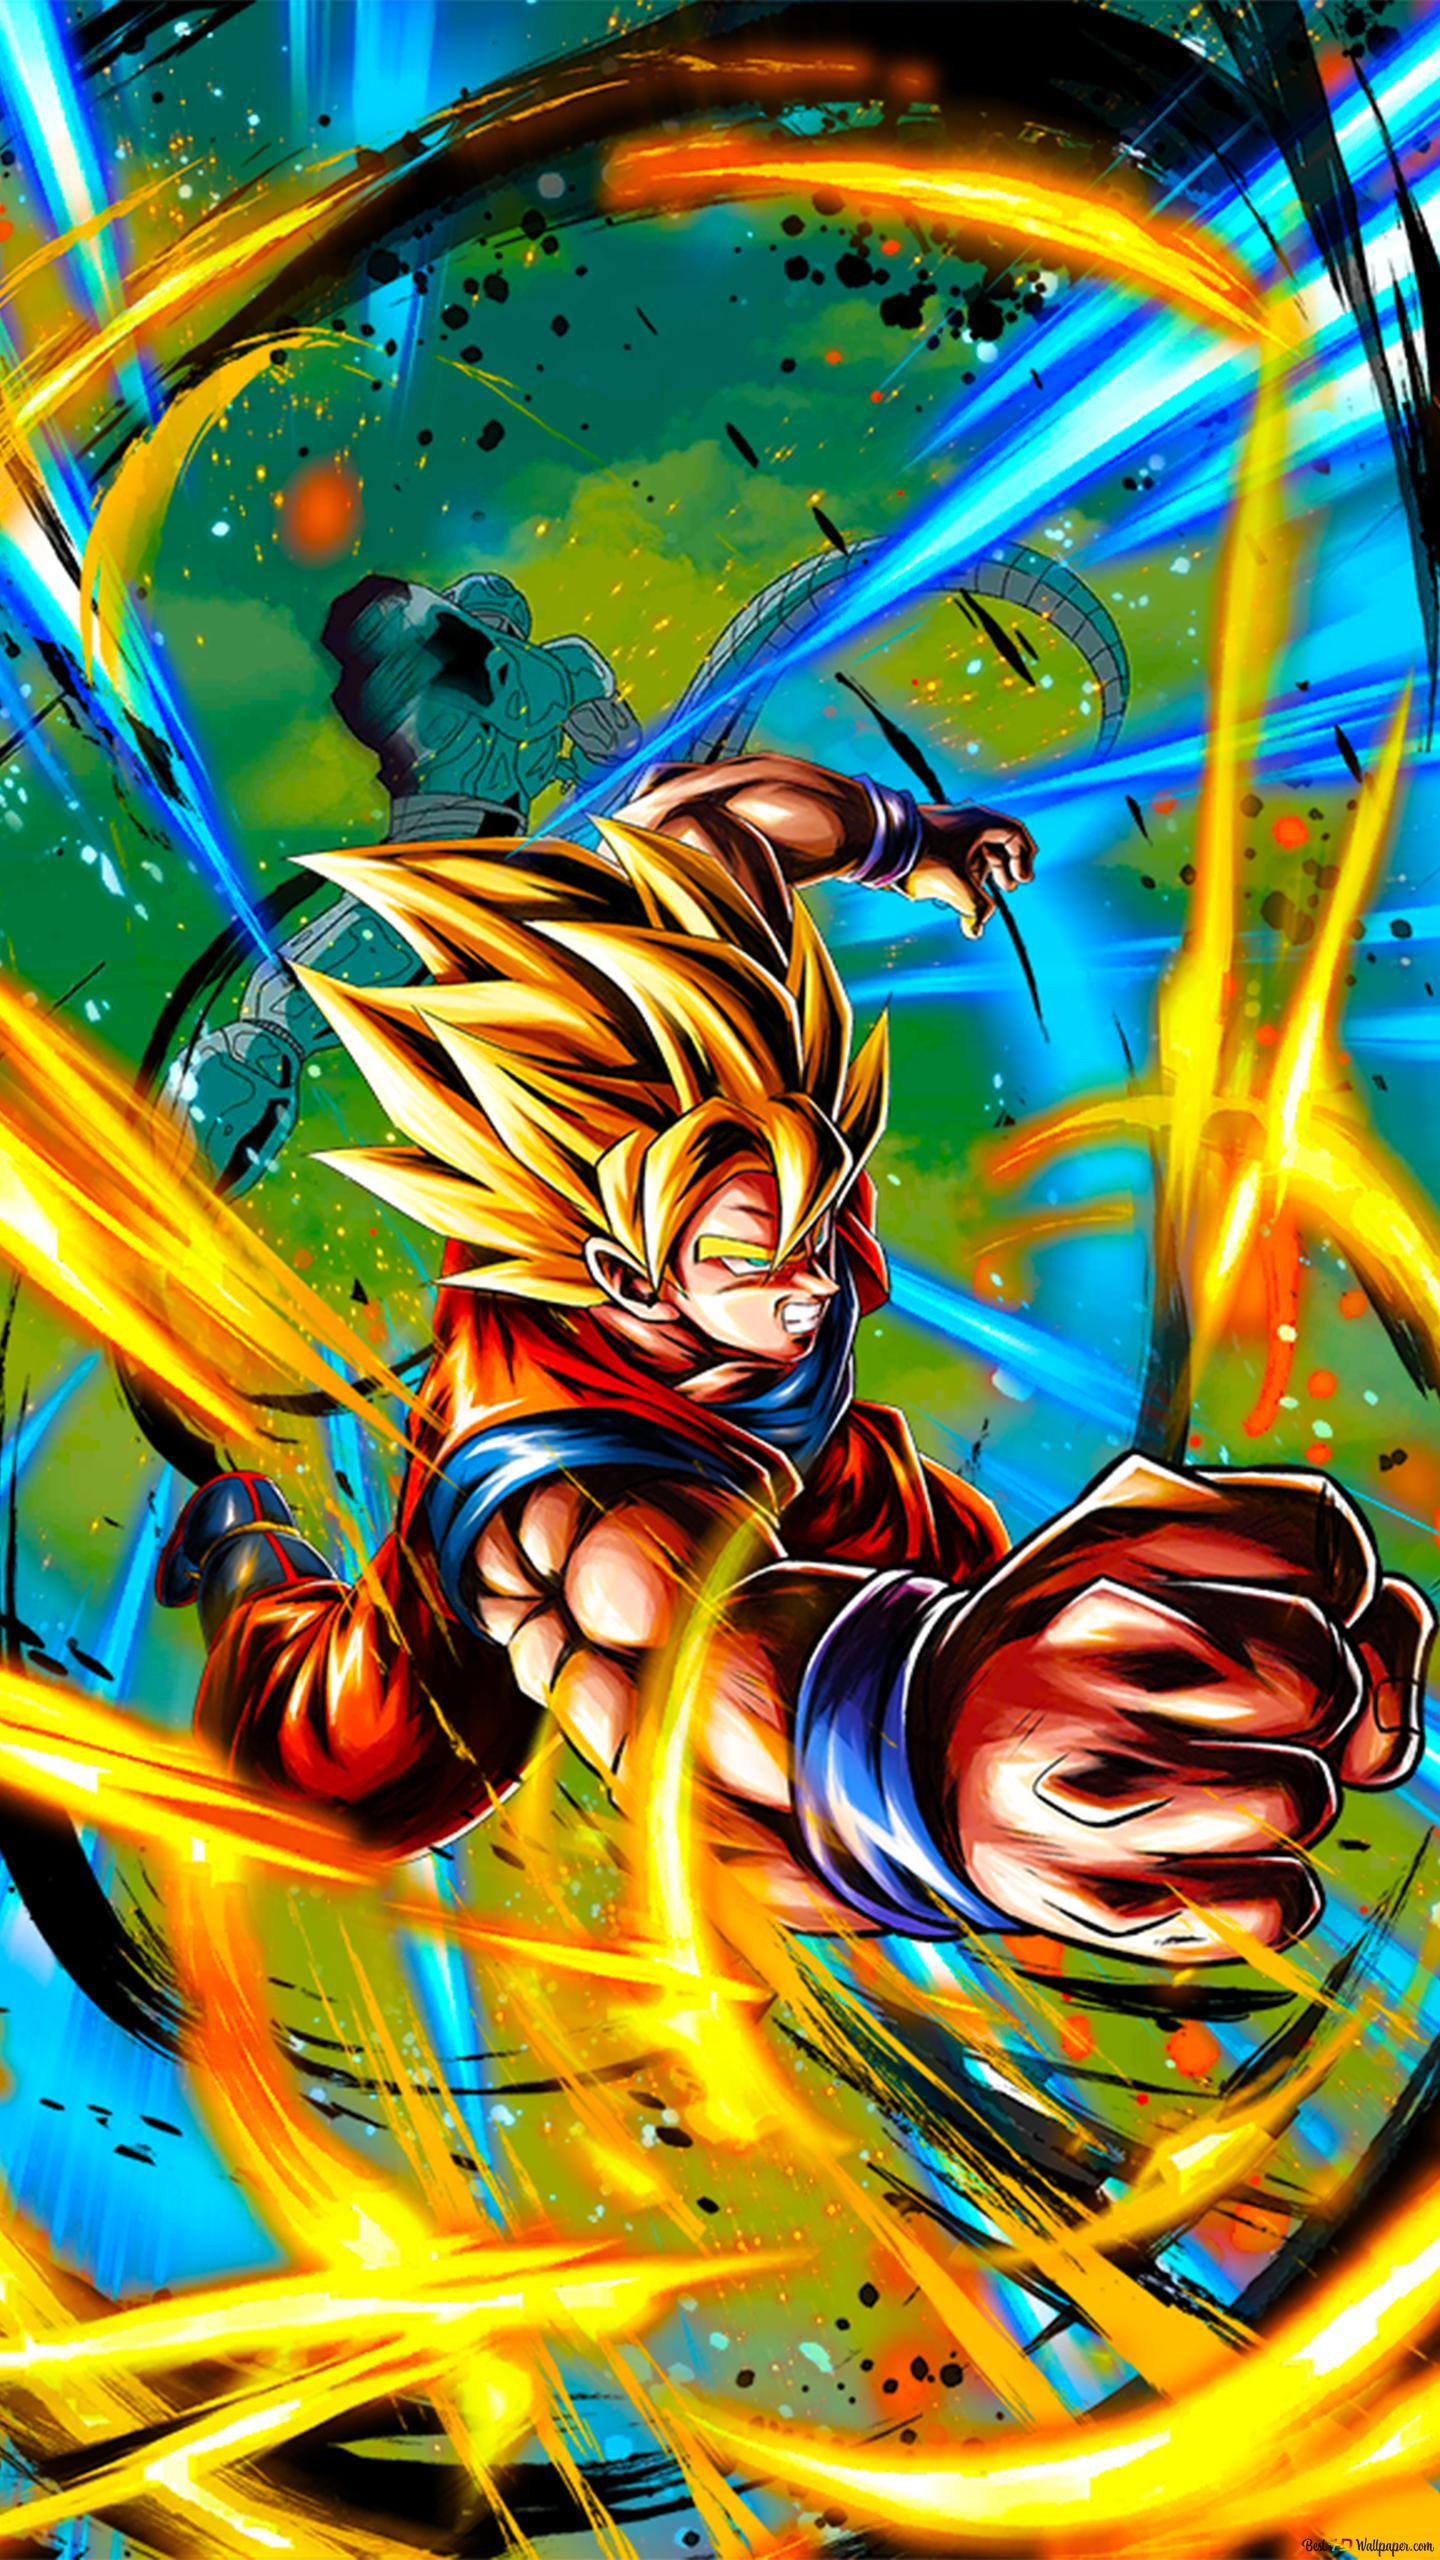 Super Saiyan Goku Film Dragon Ball Z 7 Kembalinya Cooler Android Unduhan Wallpaper Hd